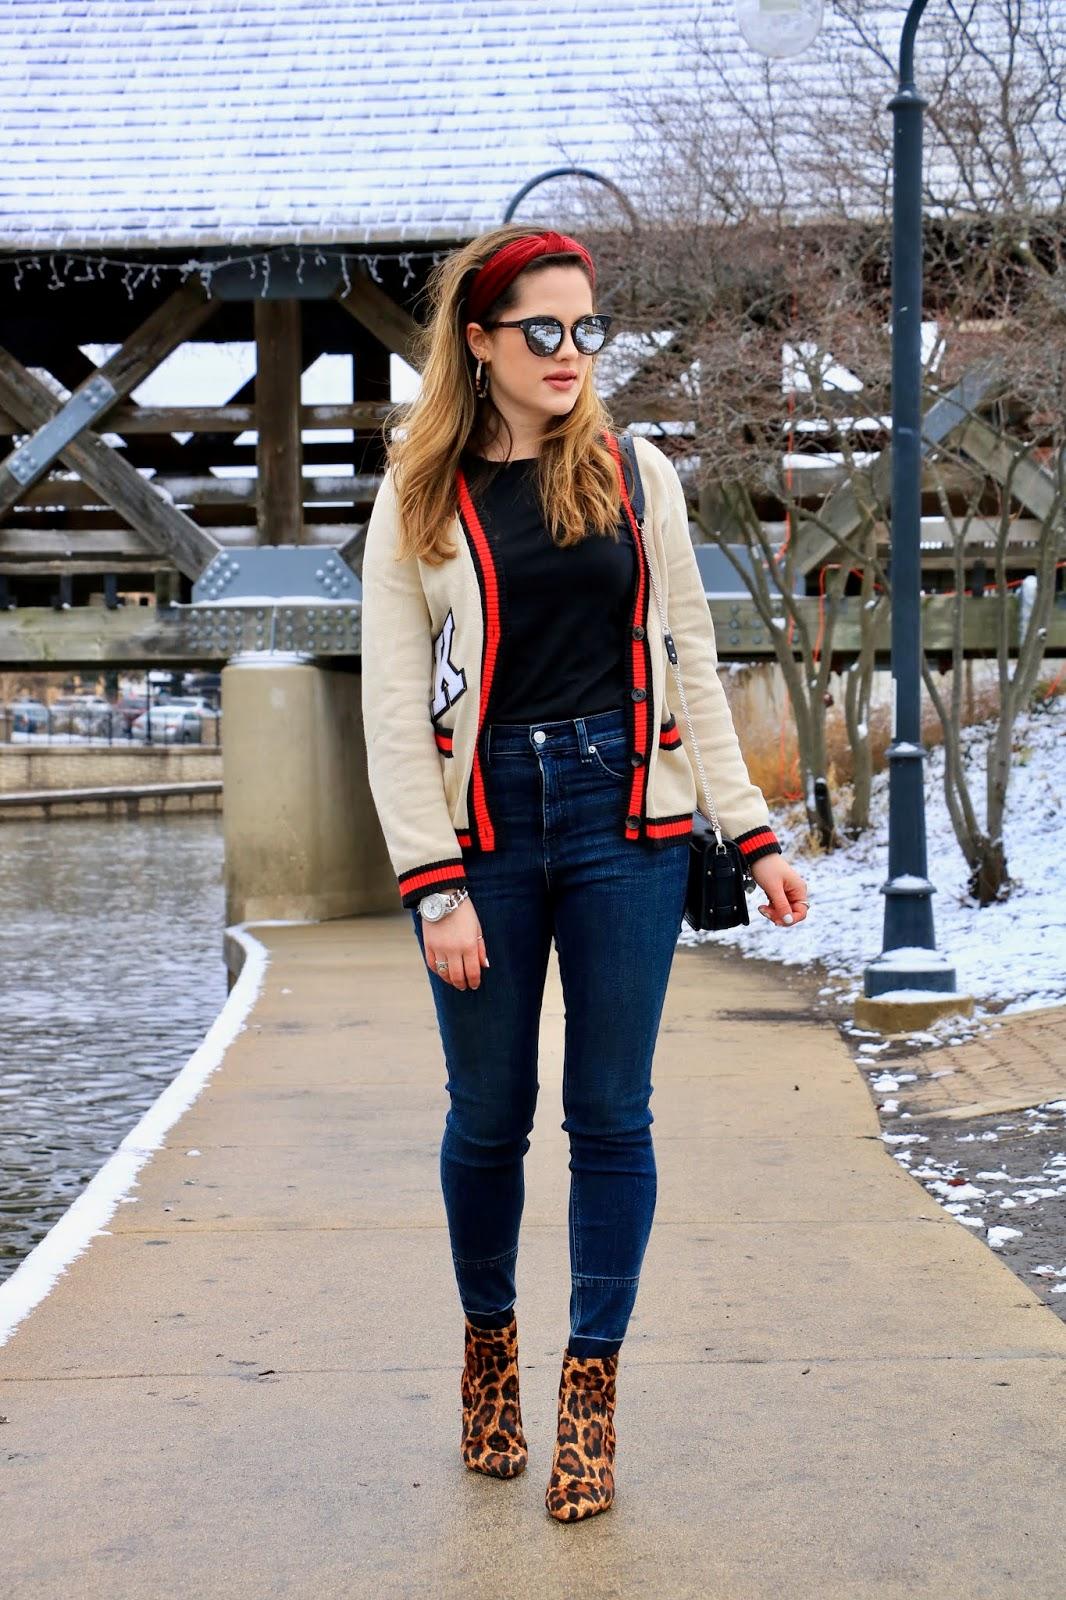 Nyc fashion blogger Kathleen Harper's winter street style 2019